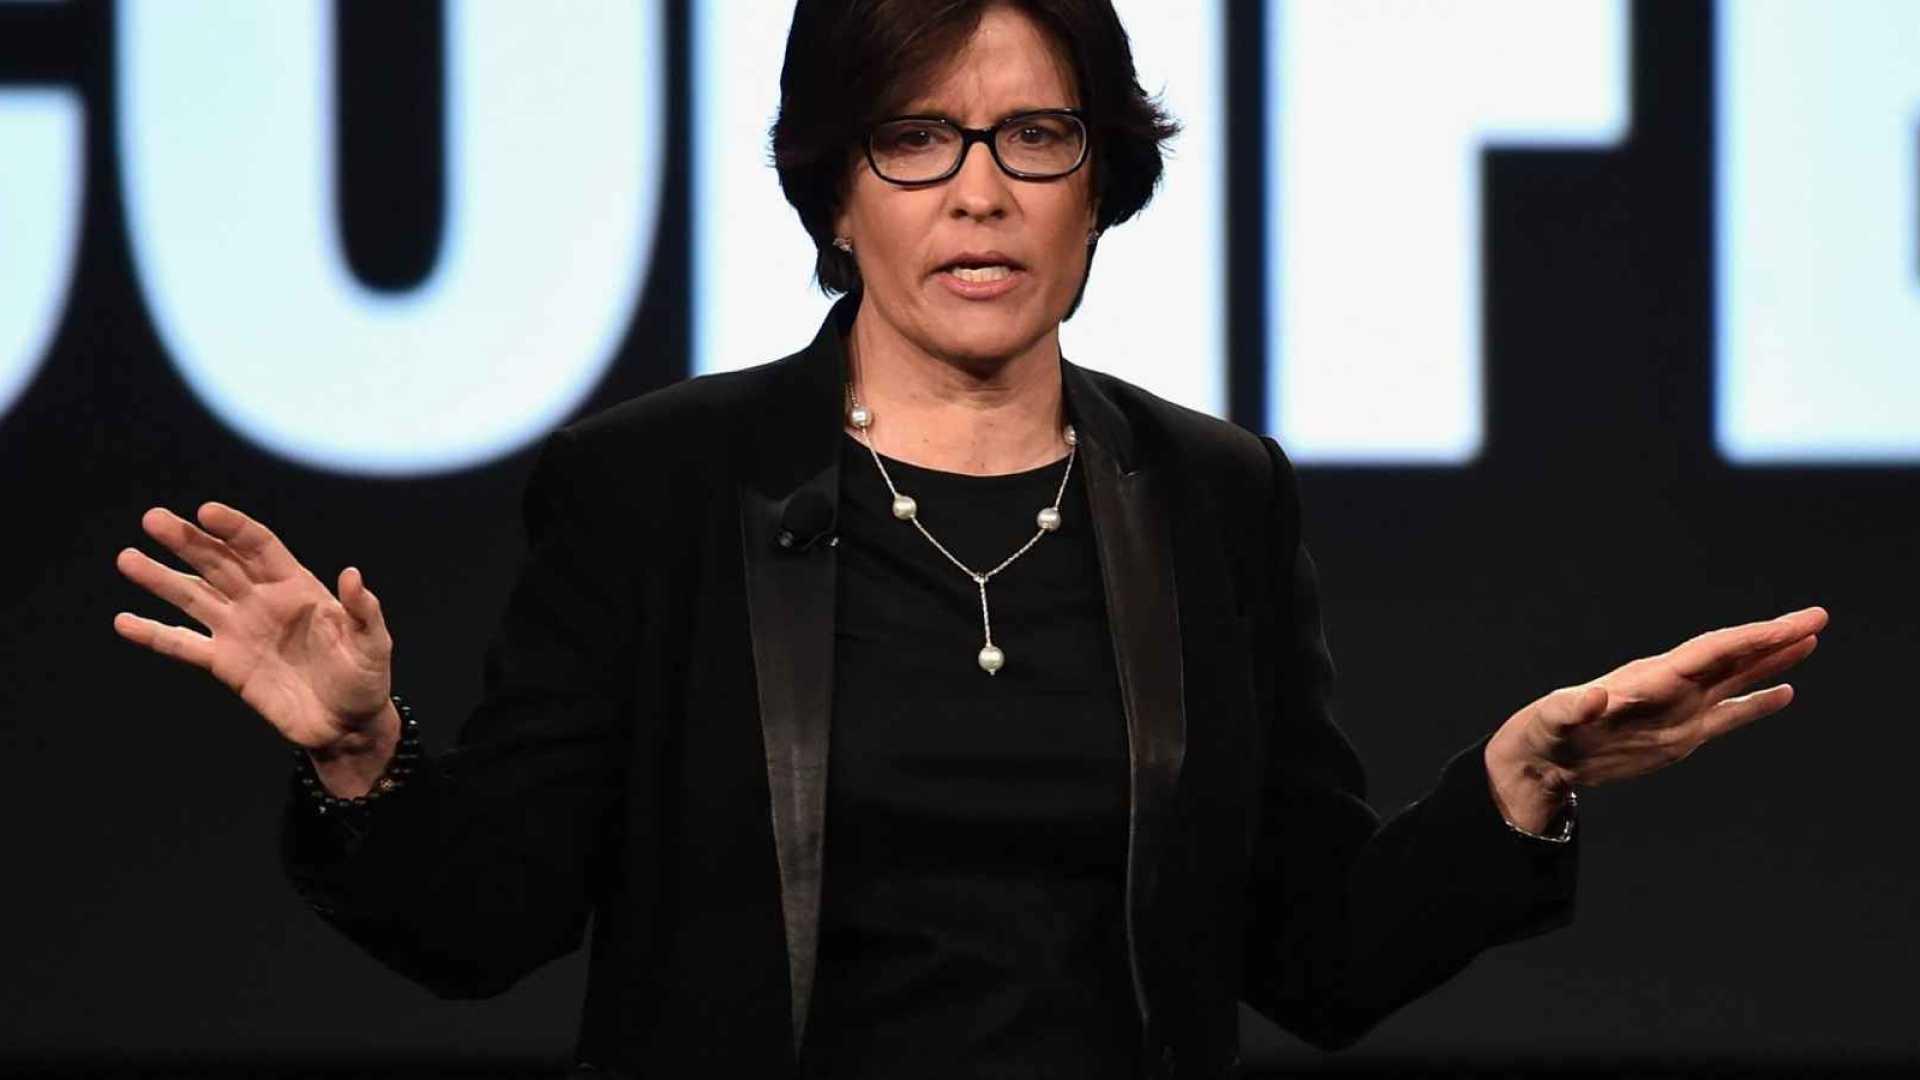 Tech Journalist Kara Swisher Says She's Going Into Politics